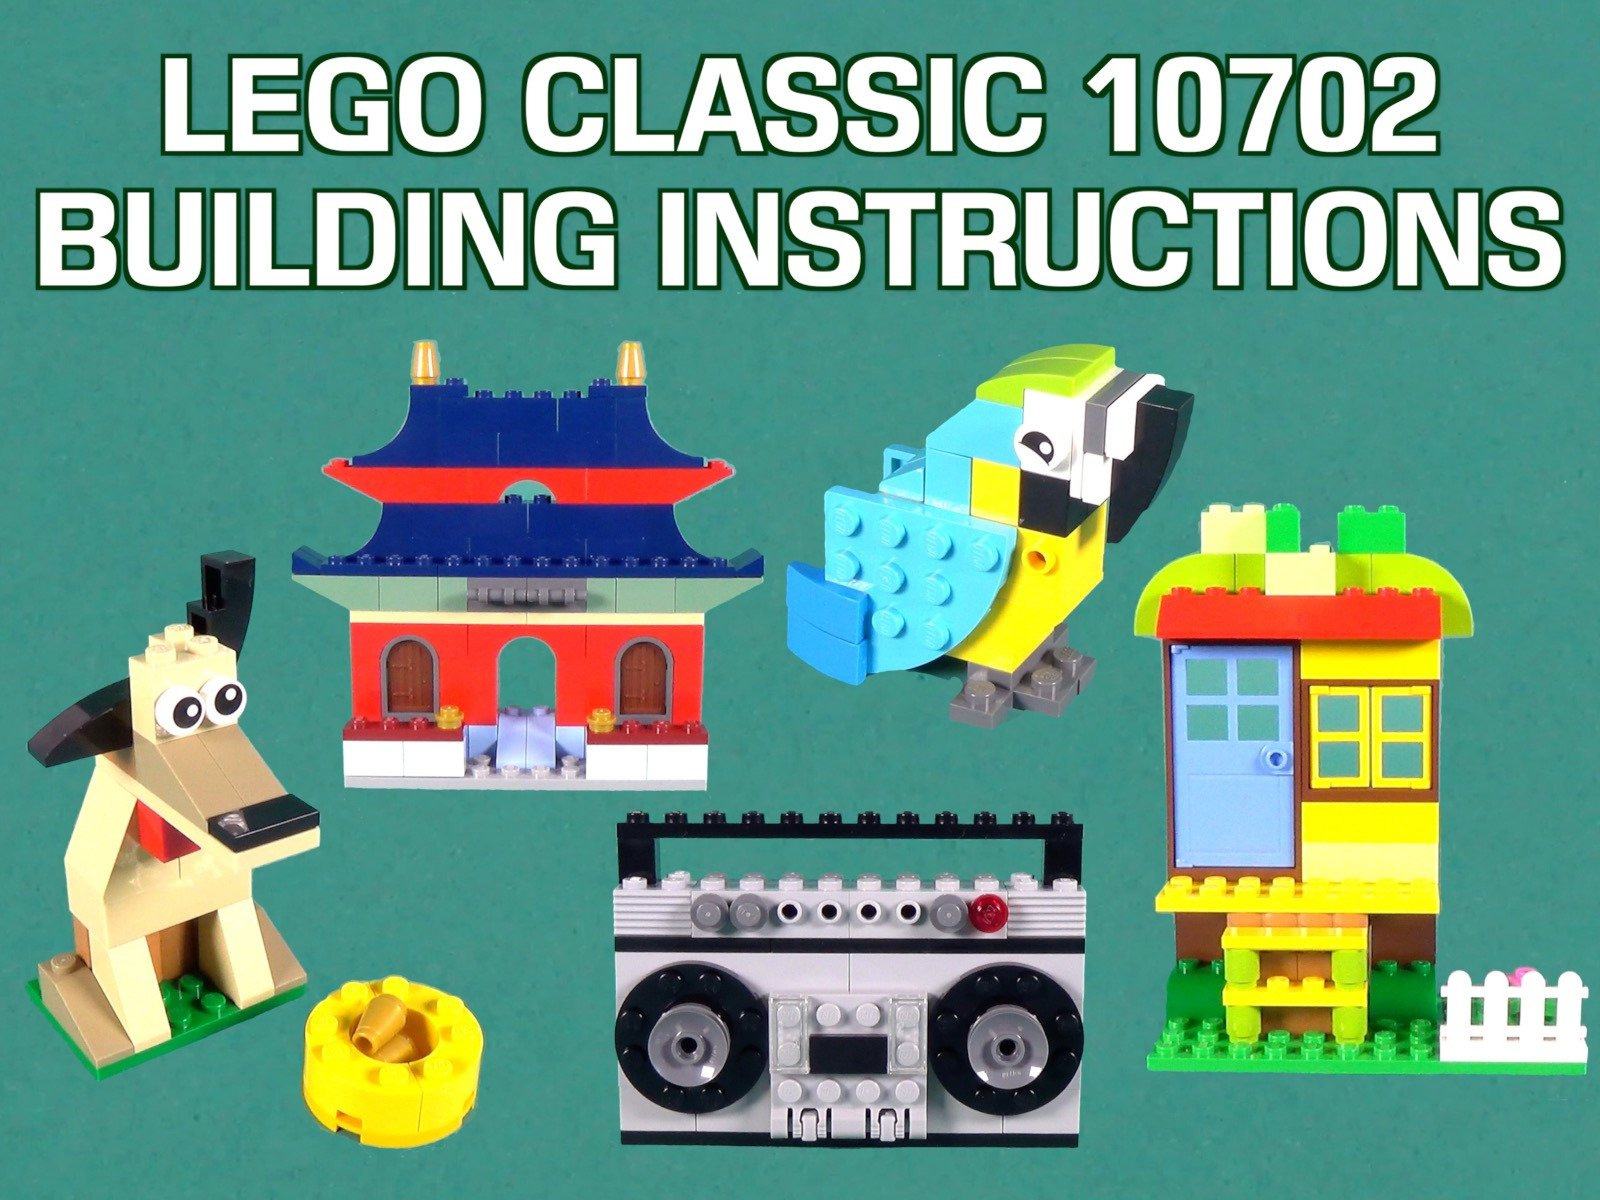 Amazon com: Watch LEGO Classic 10702 Building Instructions